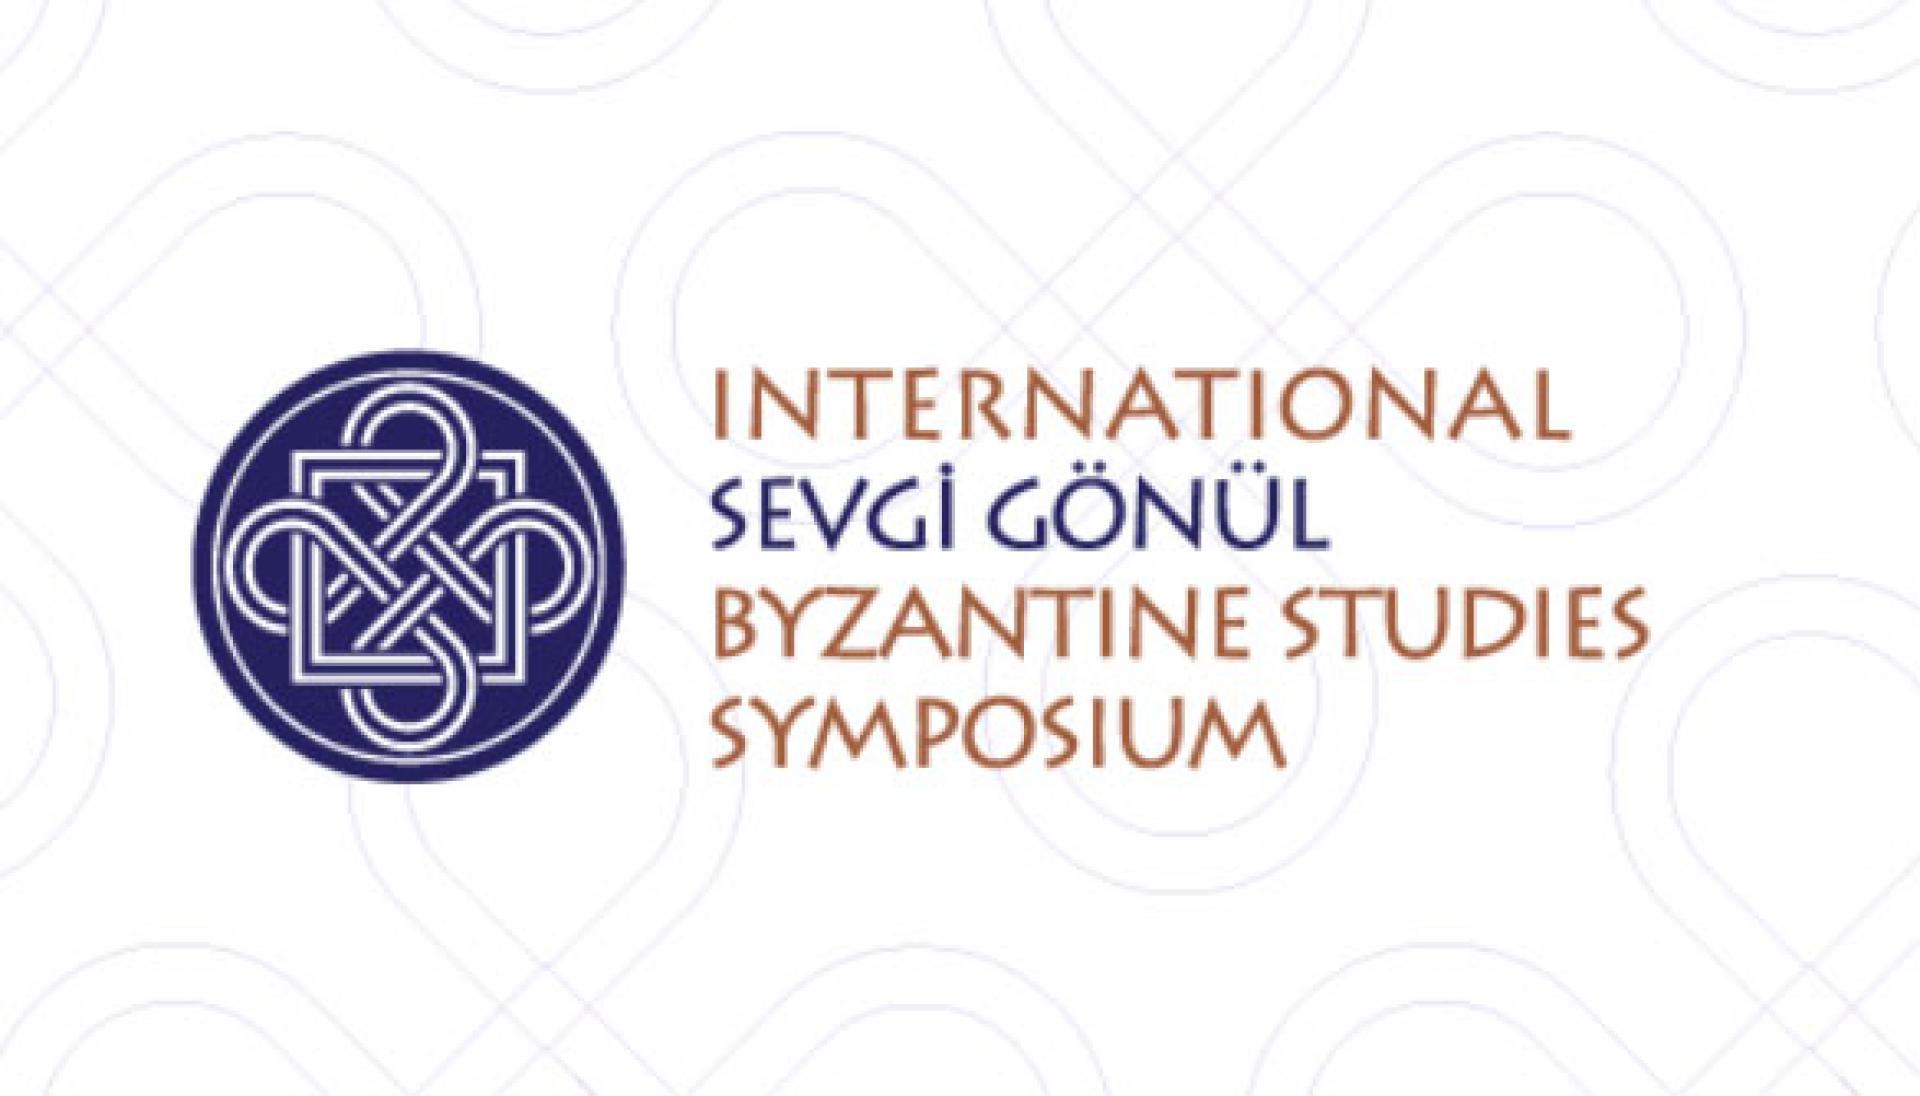 Sevgi Gönül Byzantine Studies Symposium